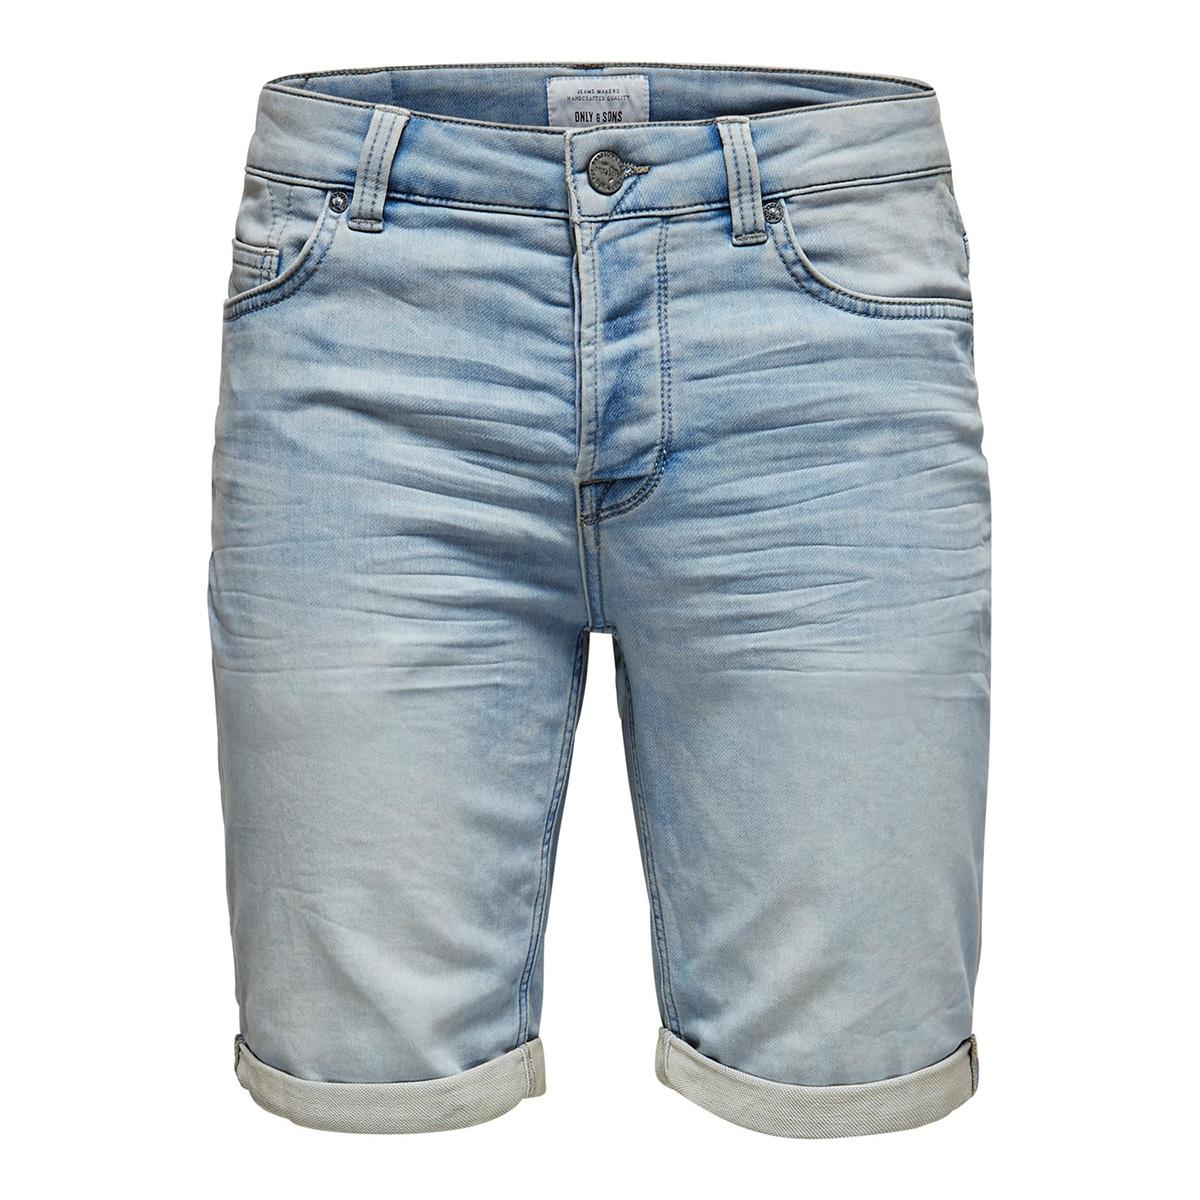 onsply sweat l blue pk 2973 noos 22012973 only & sons korte broek blue denim